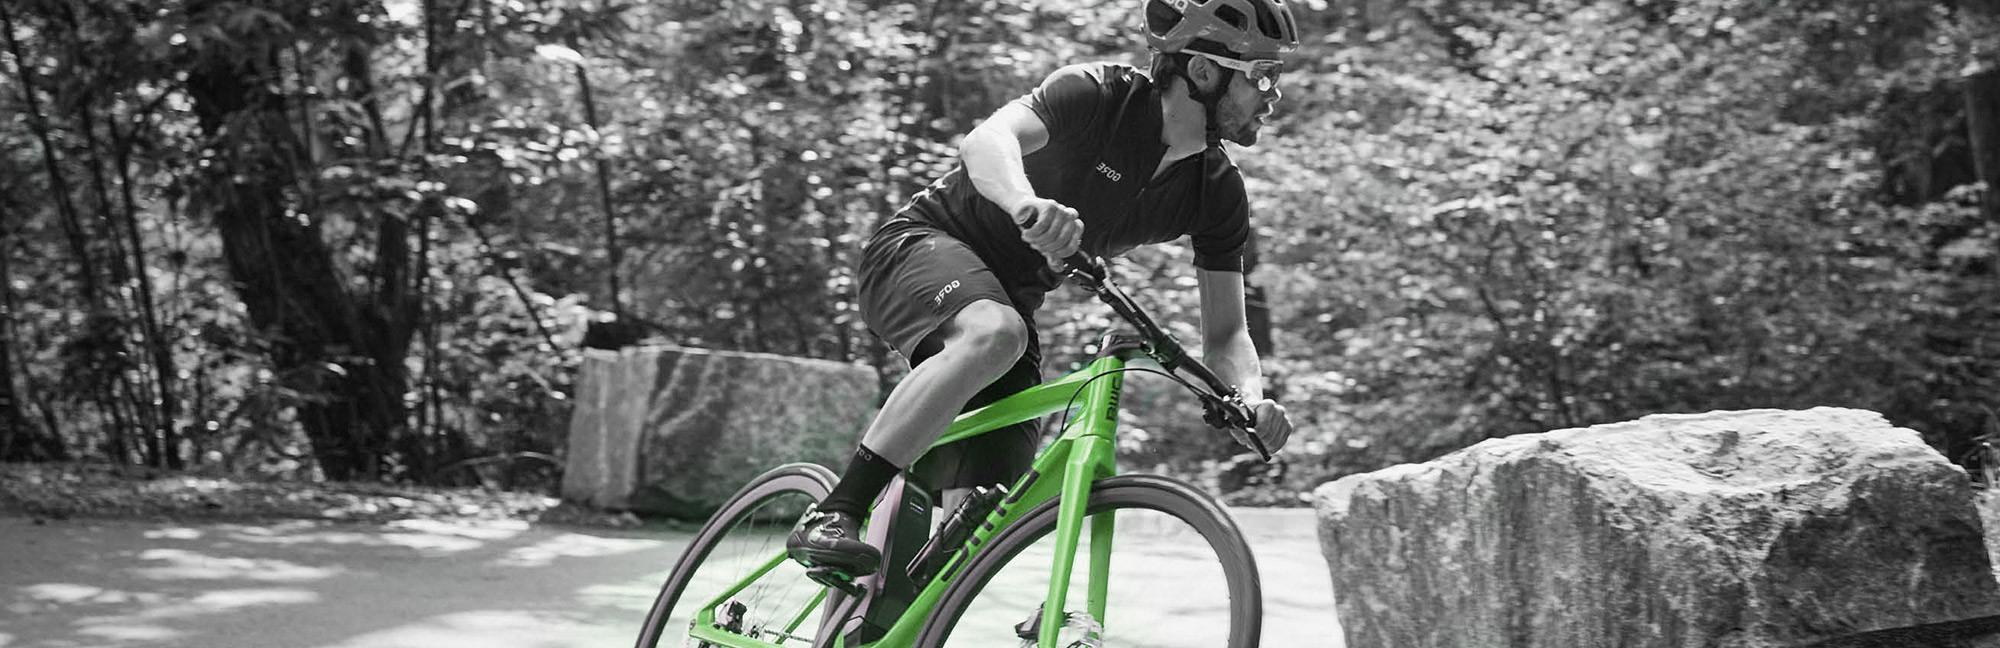 vendita noleggio e-bike